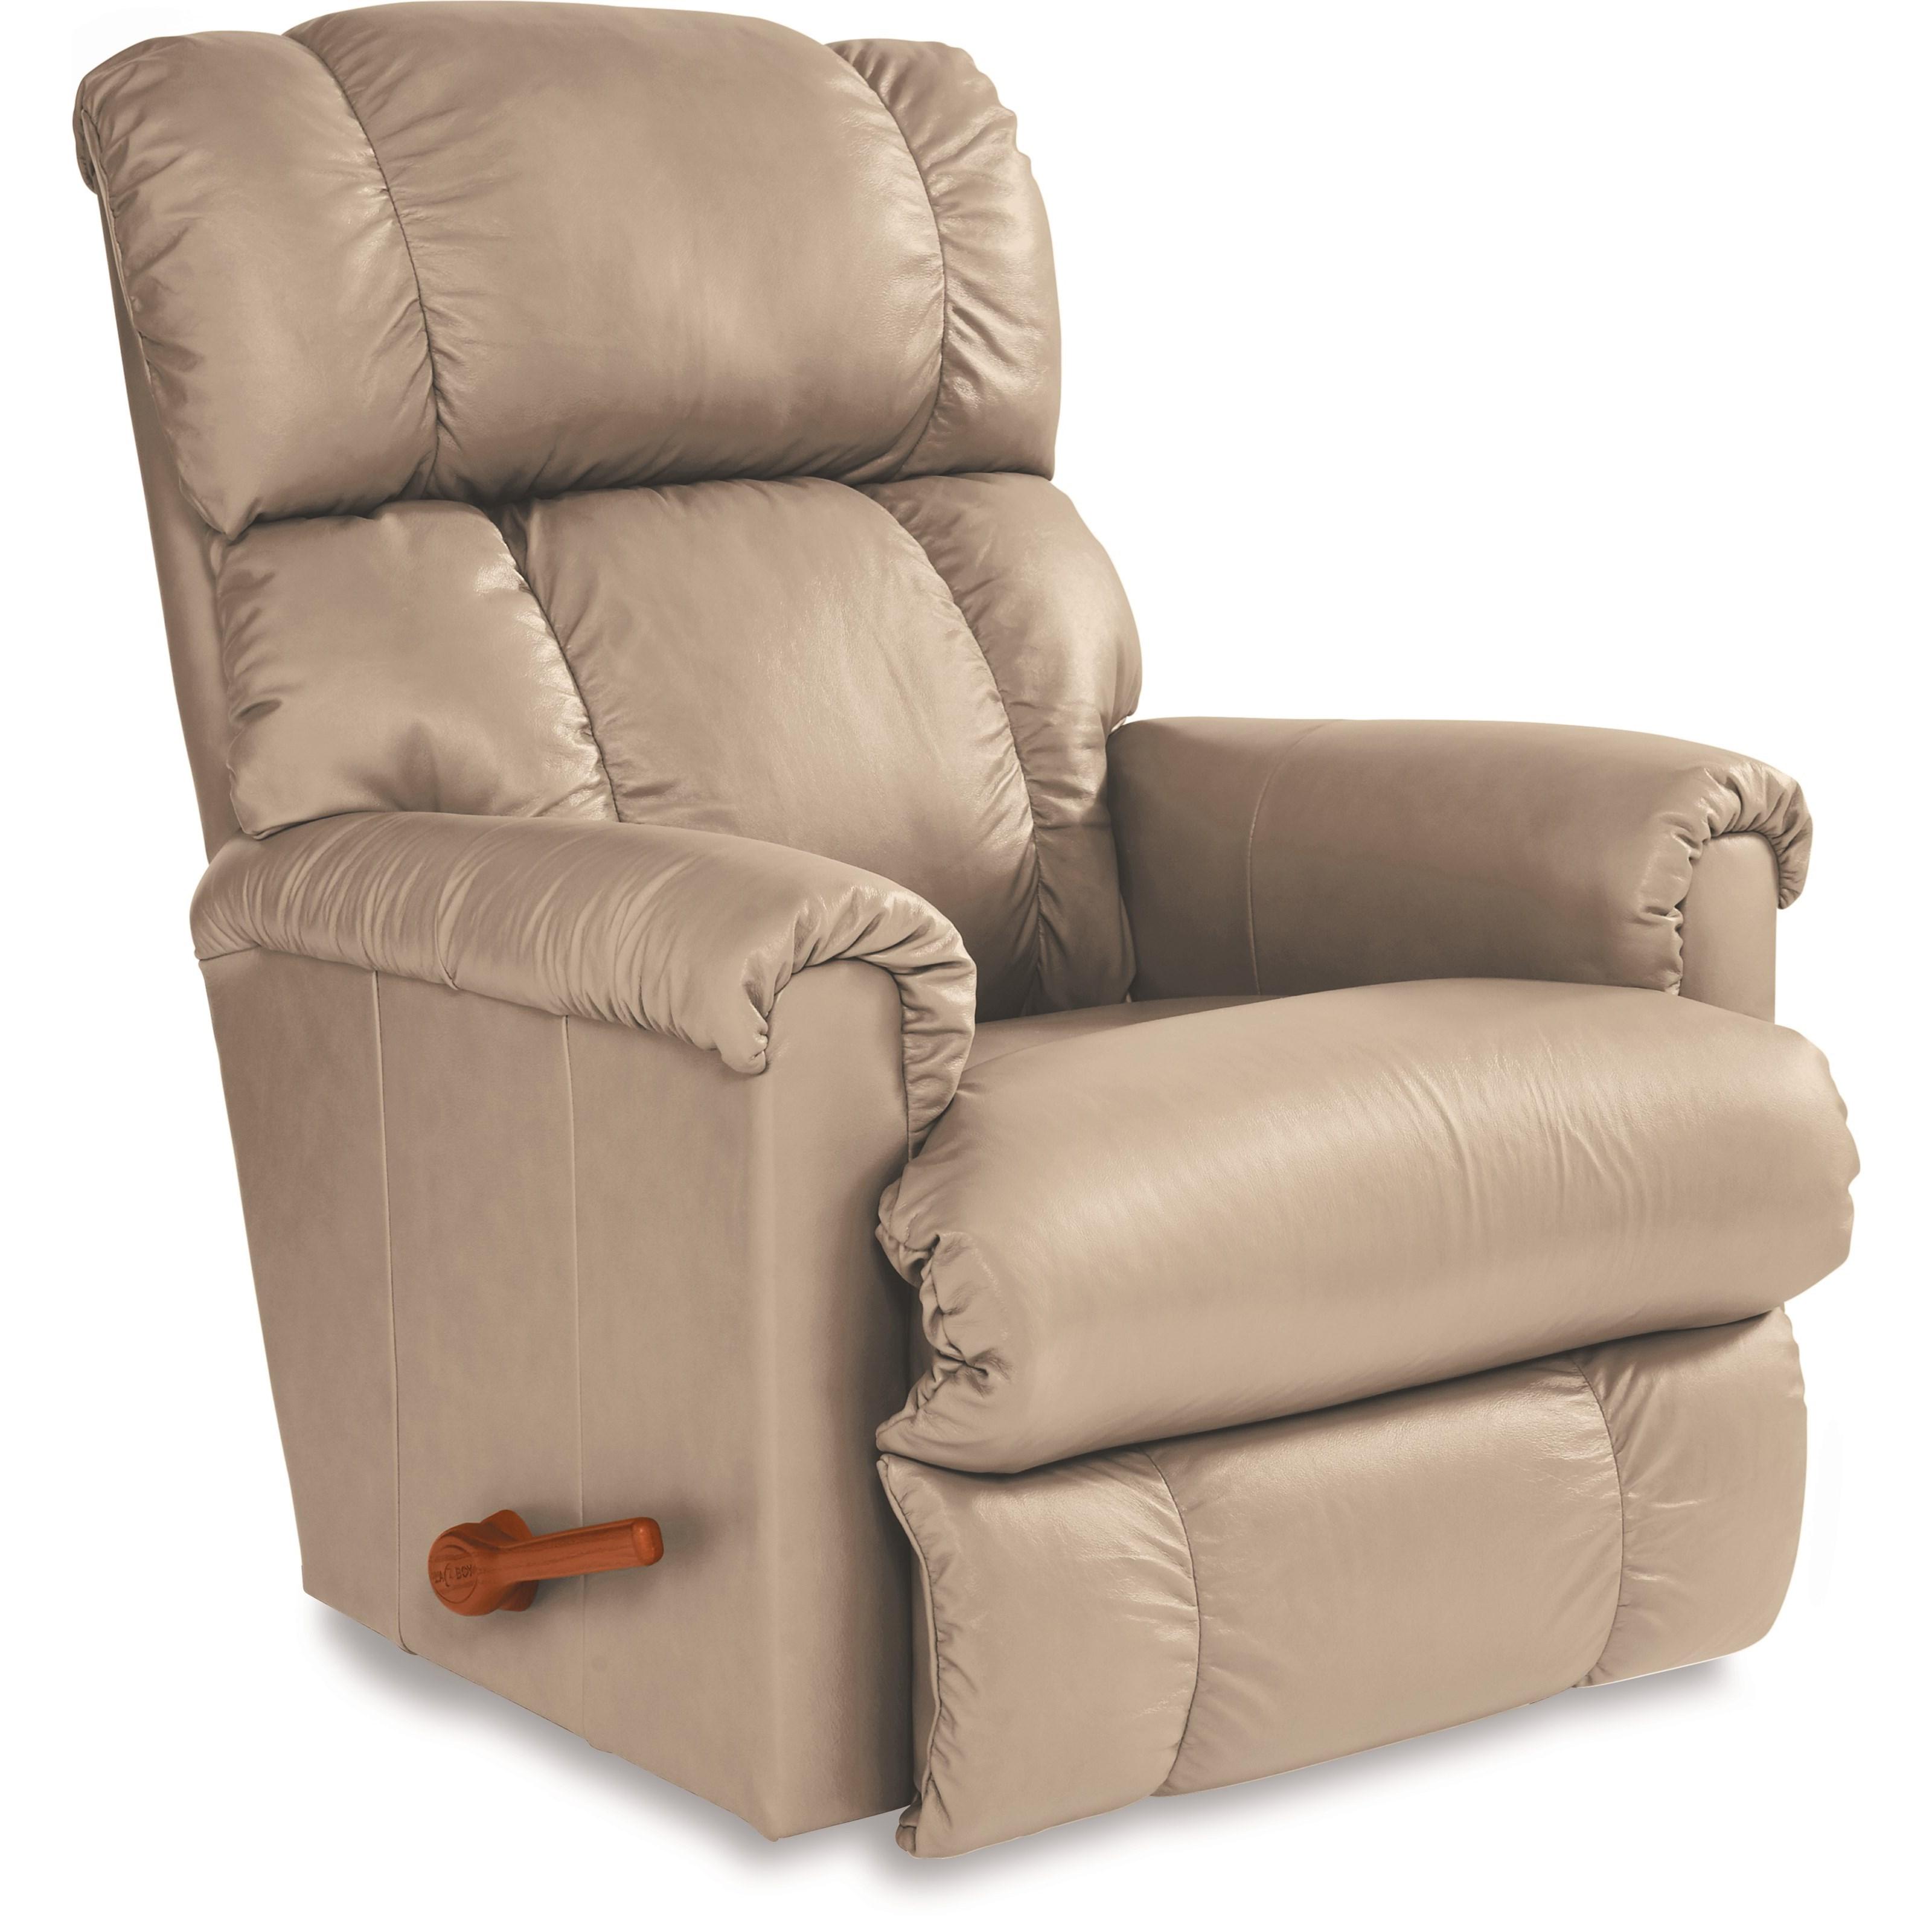 Awesome Pinnacle Reclina Rocker Recliner Inzonedesignstudio Interior Chair Design Inzonedesignstudiocom